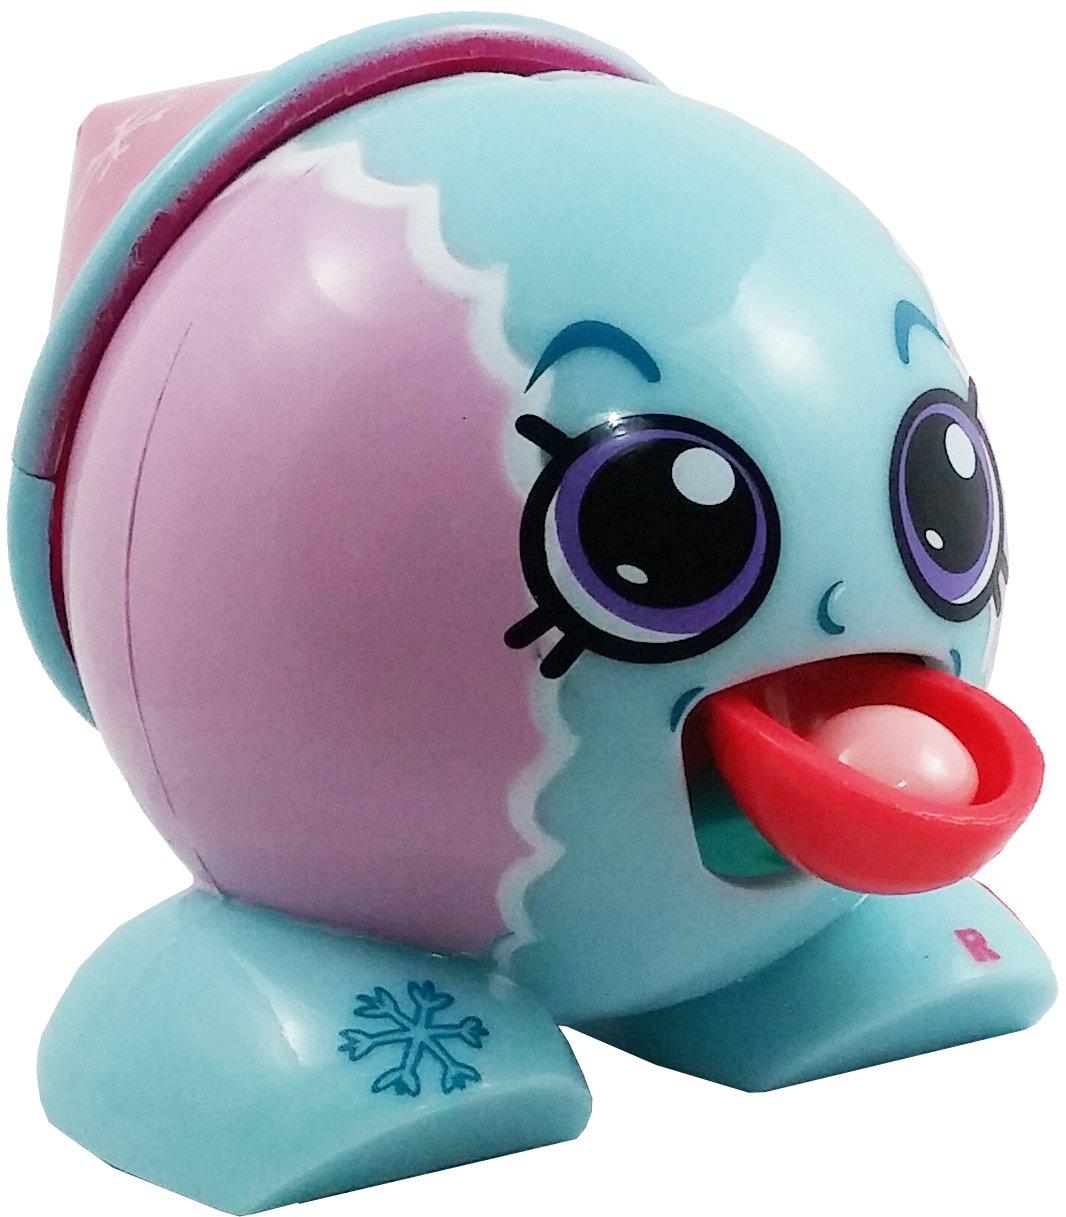 Radz Brand Shopkins Snow Crush Toy Candy Dispenser 07 Ounces Amazon Grocery Gourmet Food